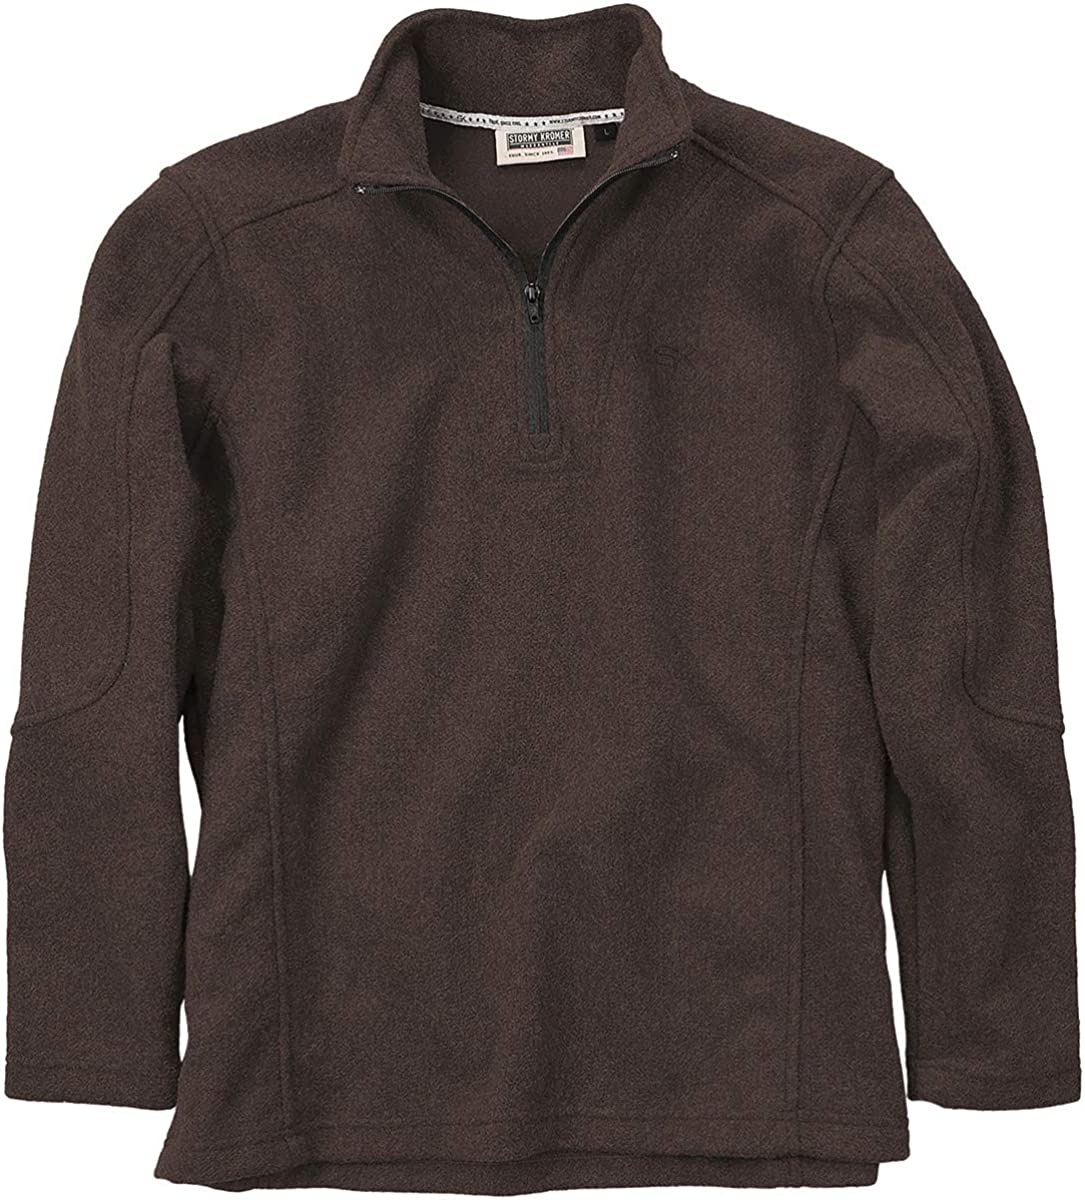 Stormy Kromer The Woolover Quarter-Zip Jacket